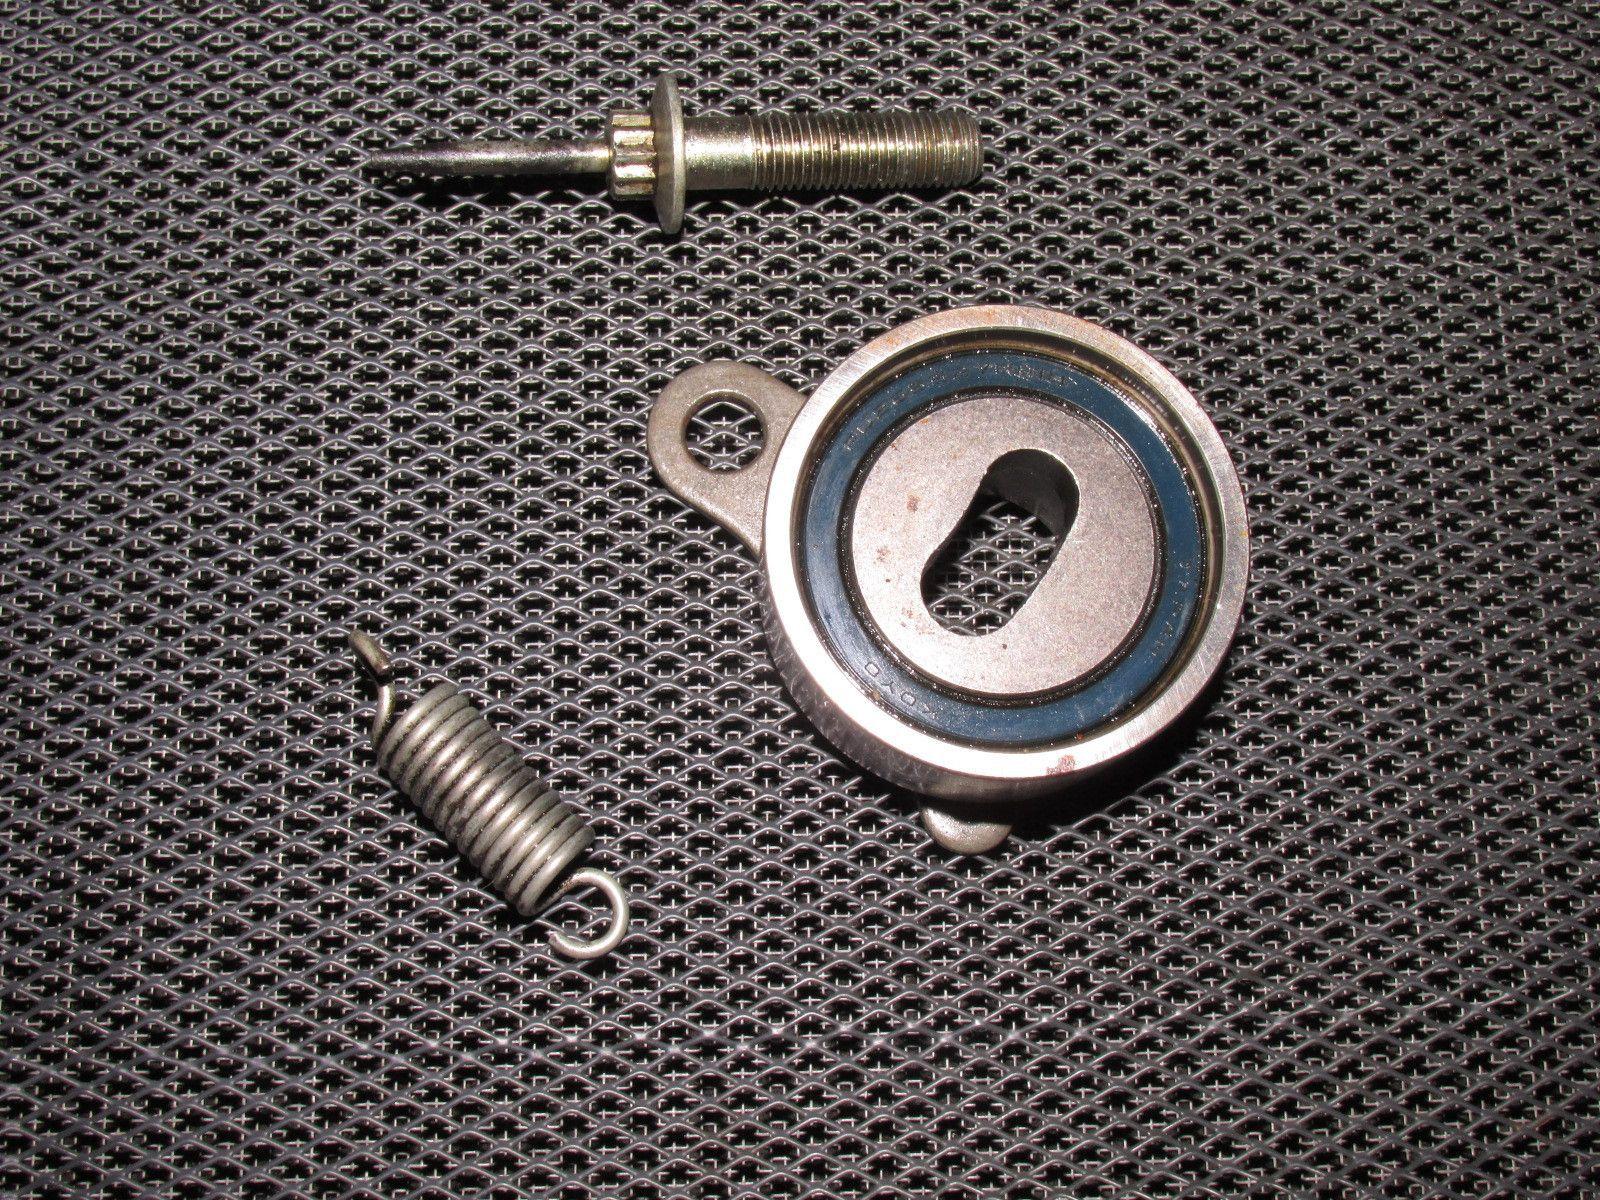 medium resolution of 85 86 87 88 89 toyota mr2 oem 4age engine timing belt tension pulley